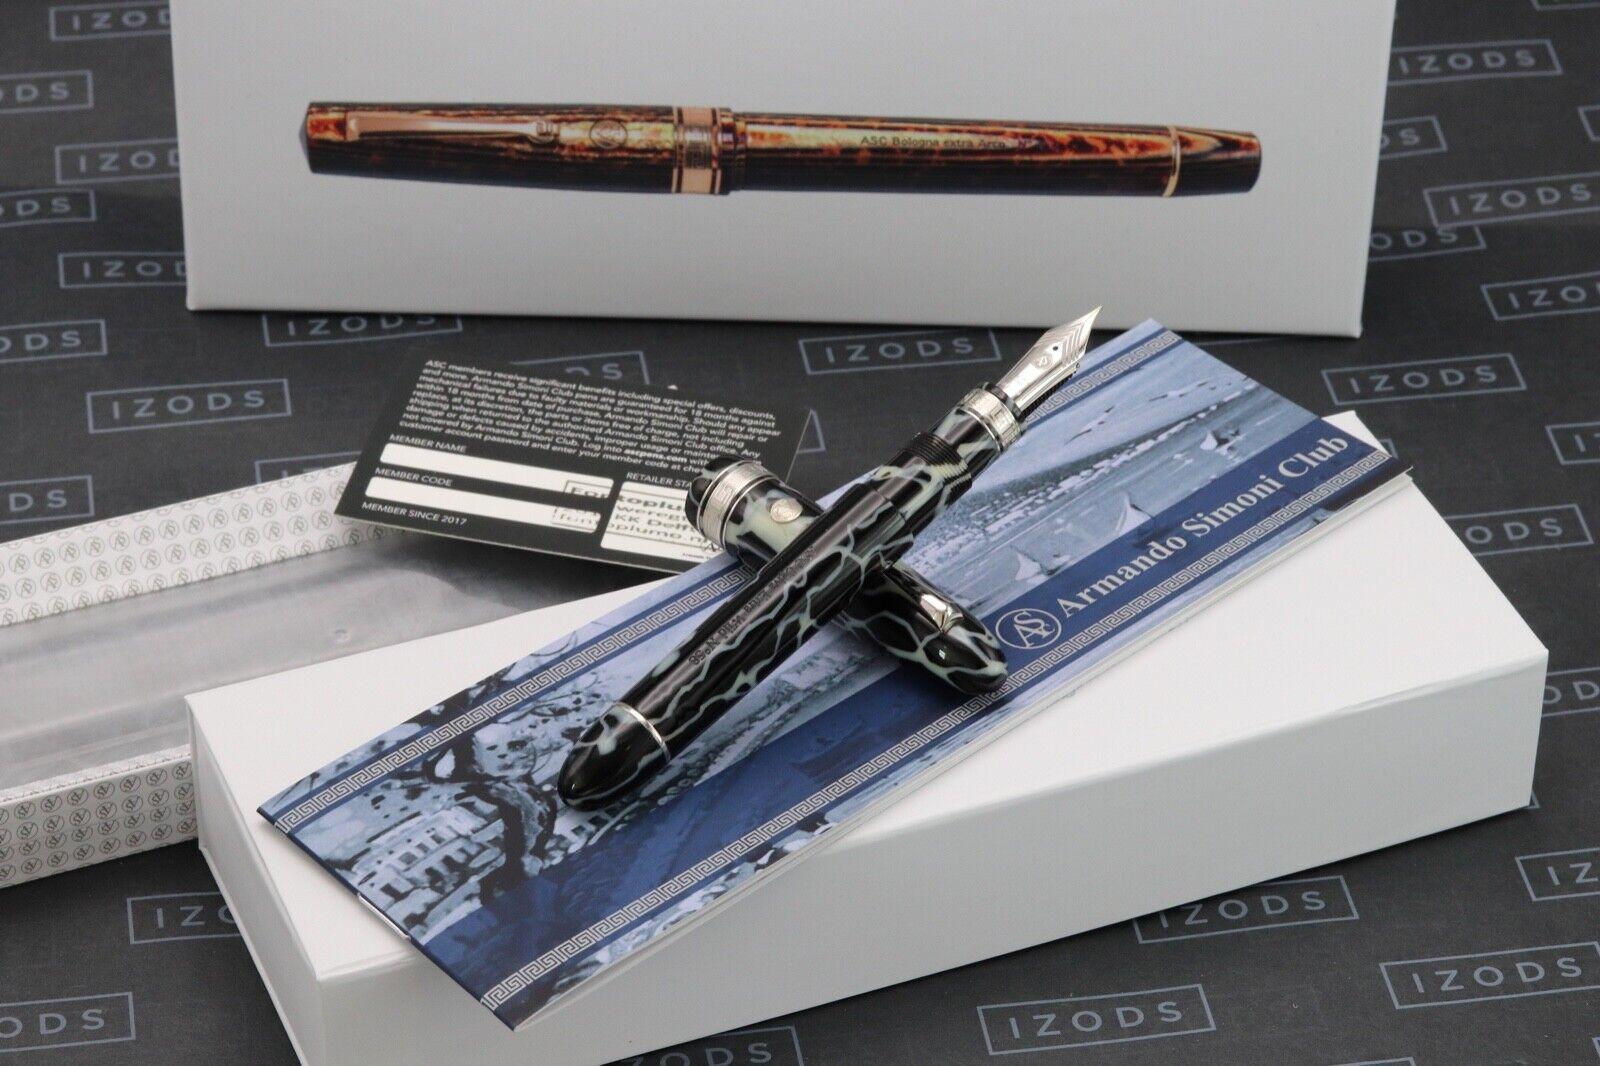 ASC Ogiva Extra Wild Celluloid Fountain Pen